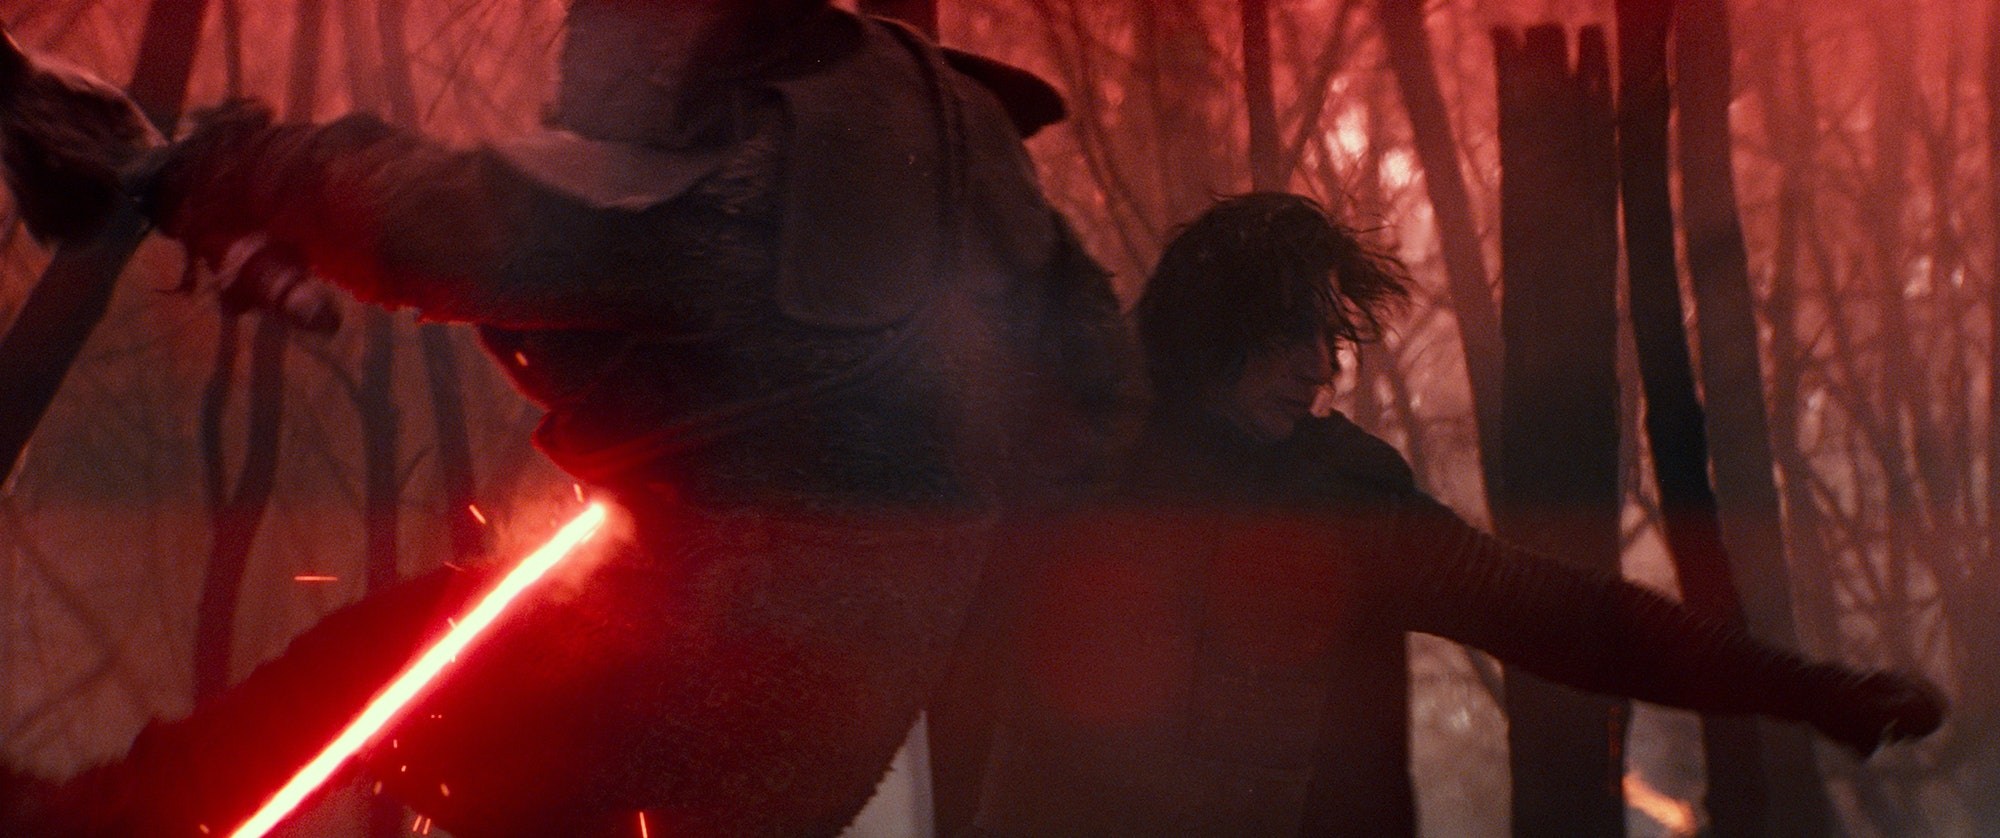 Knights of Ren Star Wars Rise of Skywalker Kylo Ren